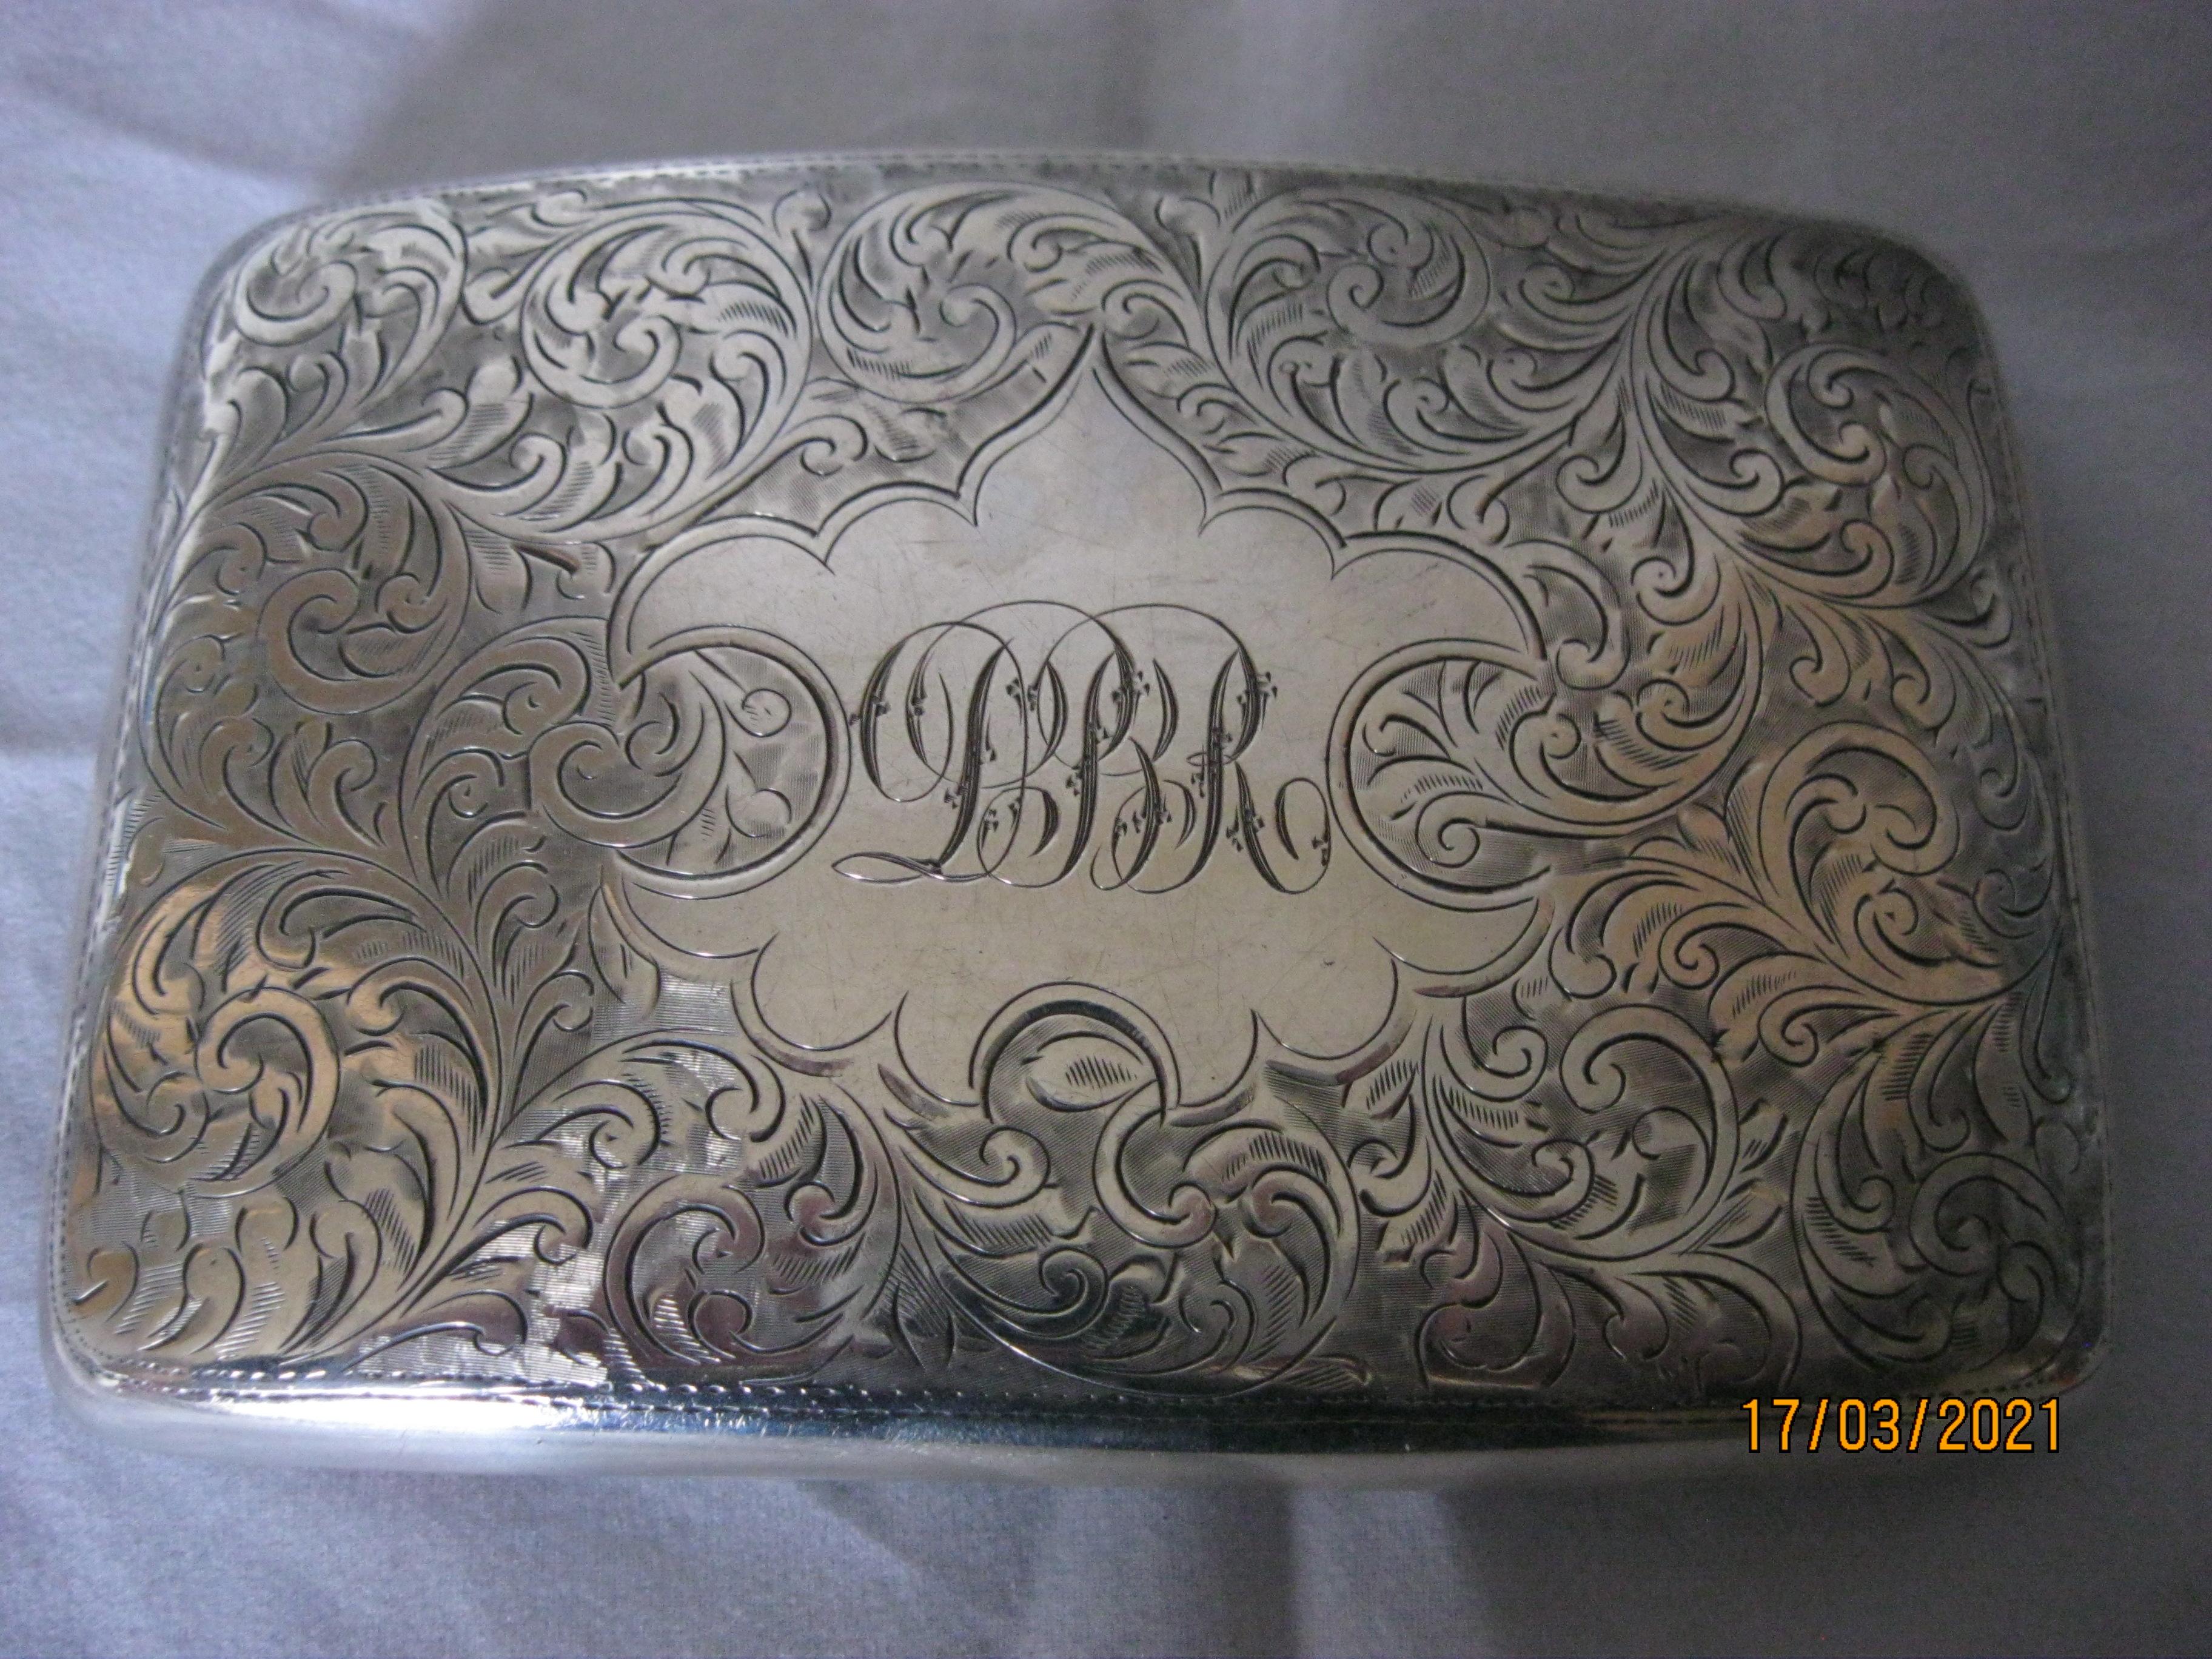 Antique Sterling Silver Cigarette Case 1921 - Image 10 of 11